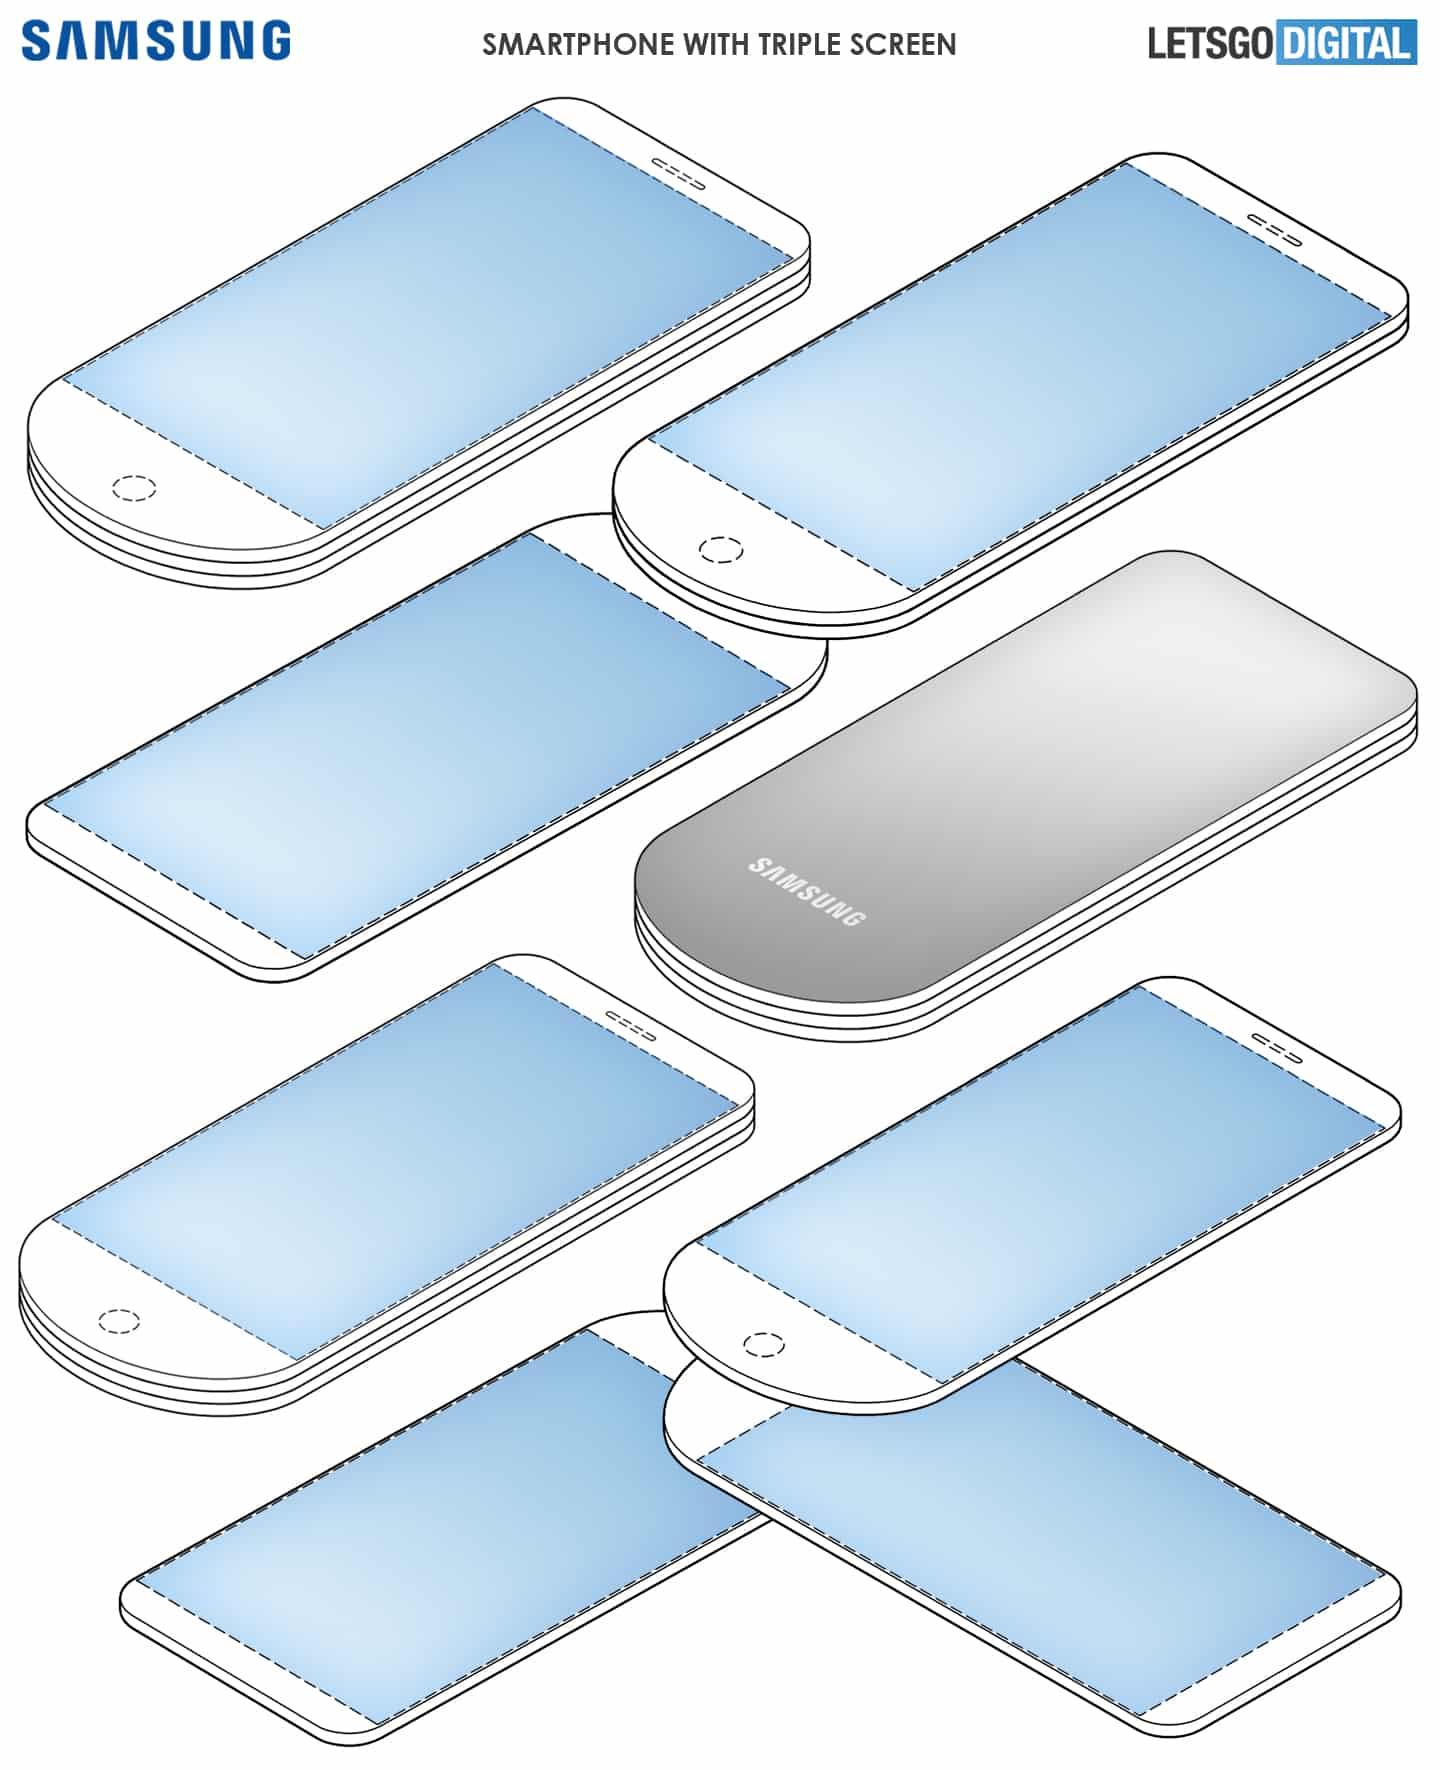 Smartfón s trojitým displejom samsung patent